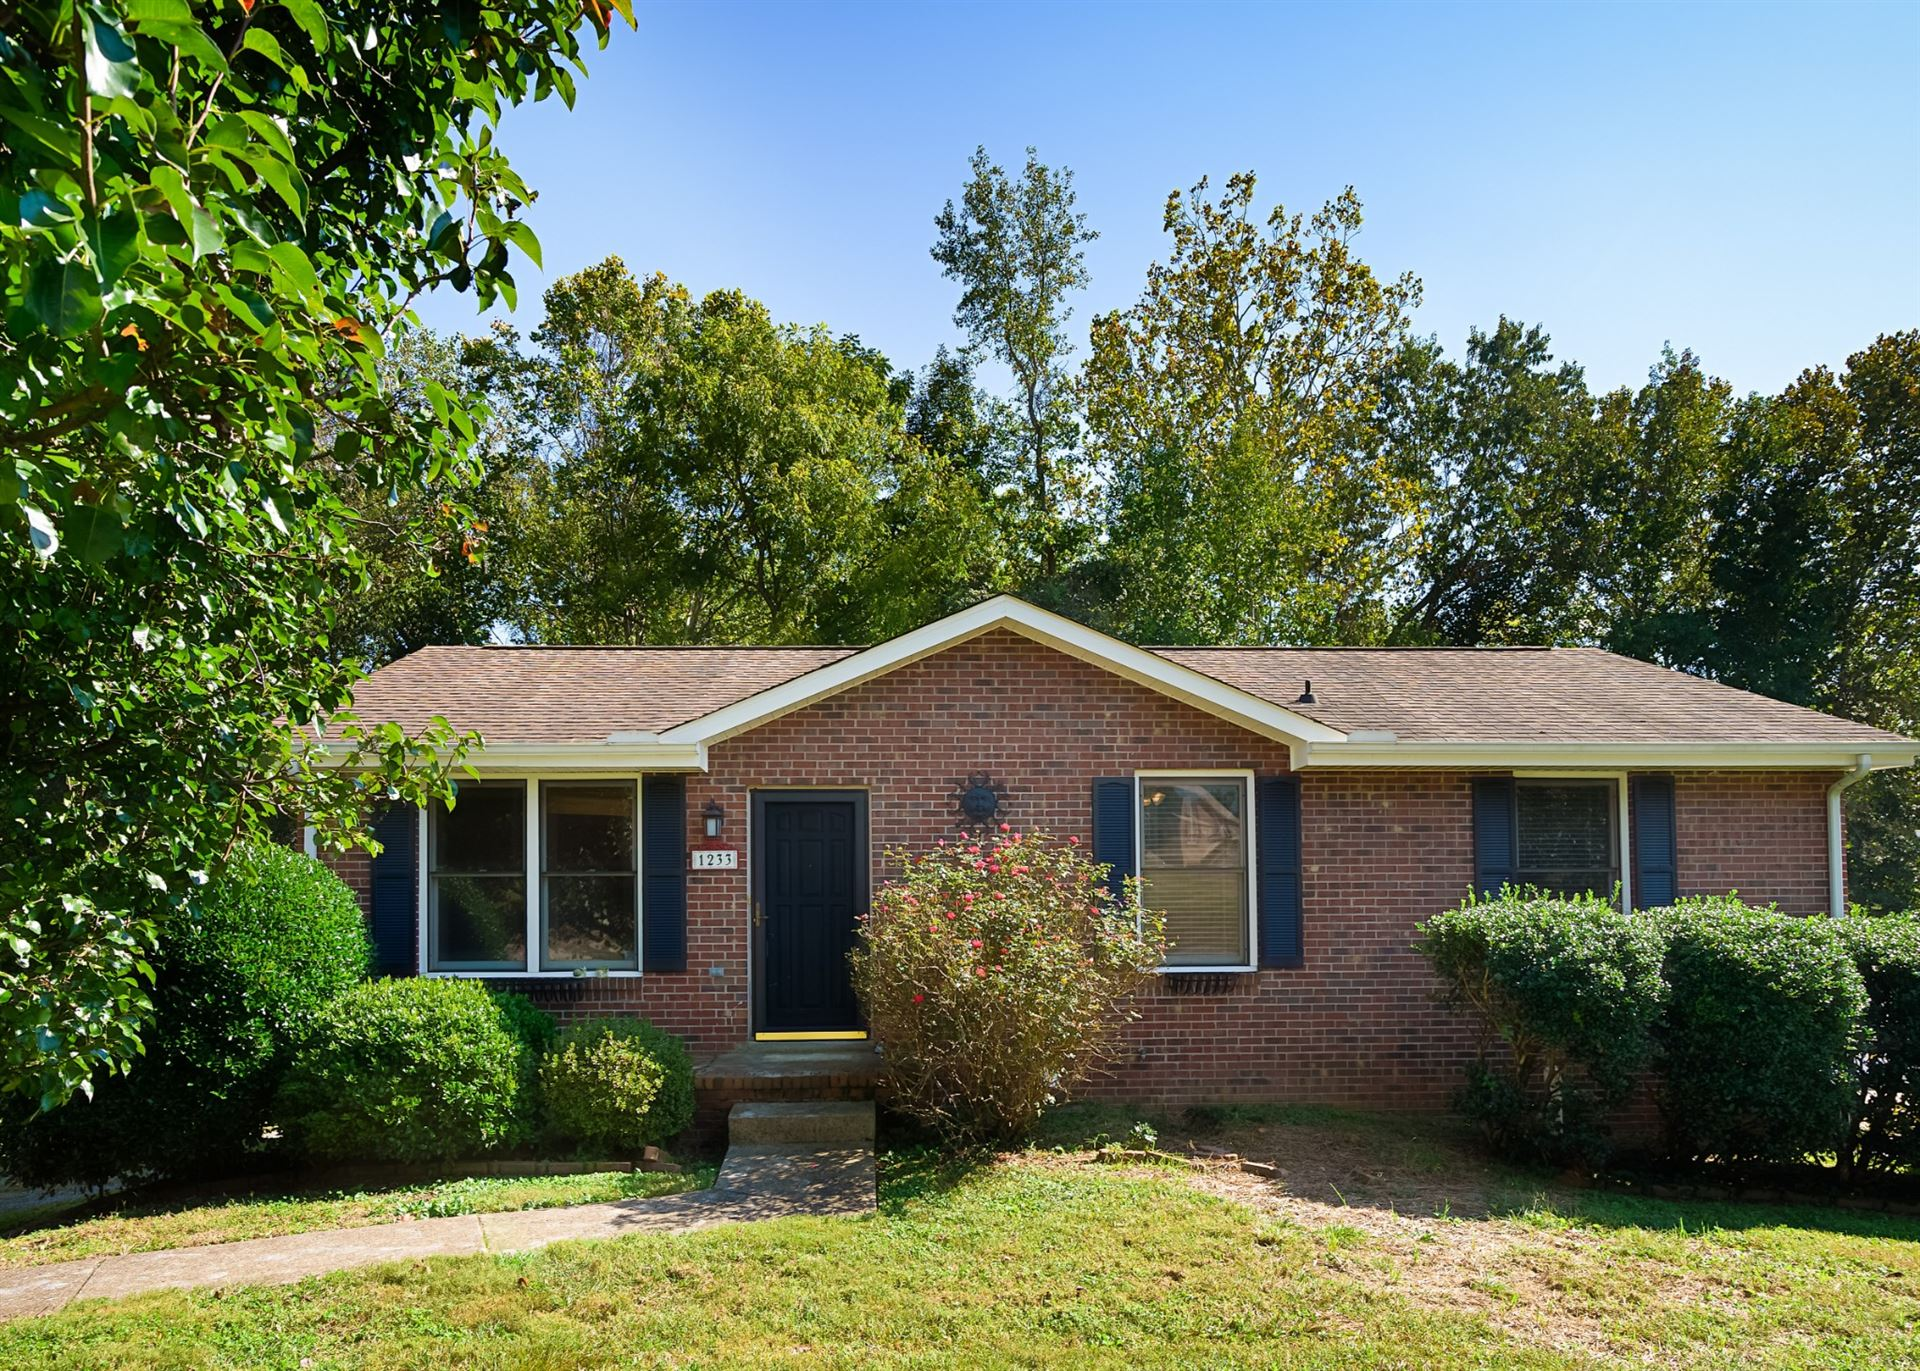 1233 Cottonwood Dr, Clarksville, TN 37040 - MLS#: 2298557